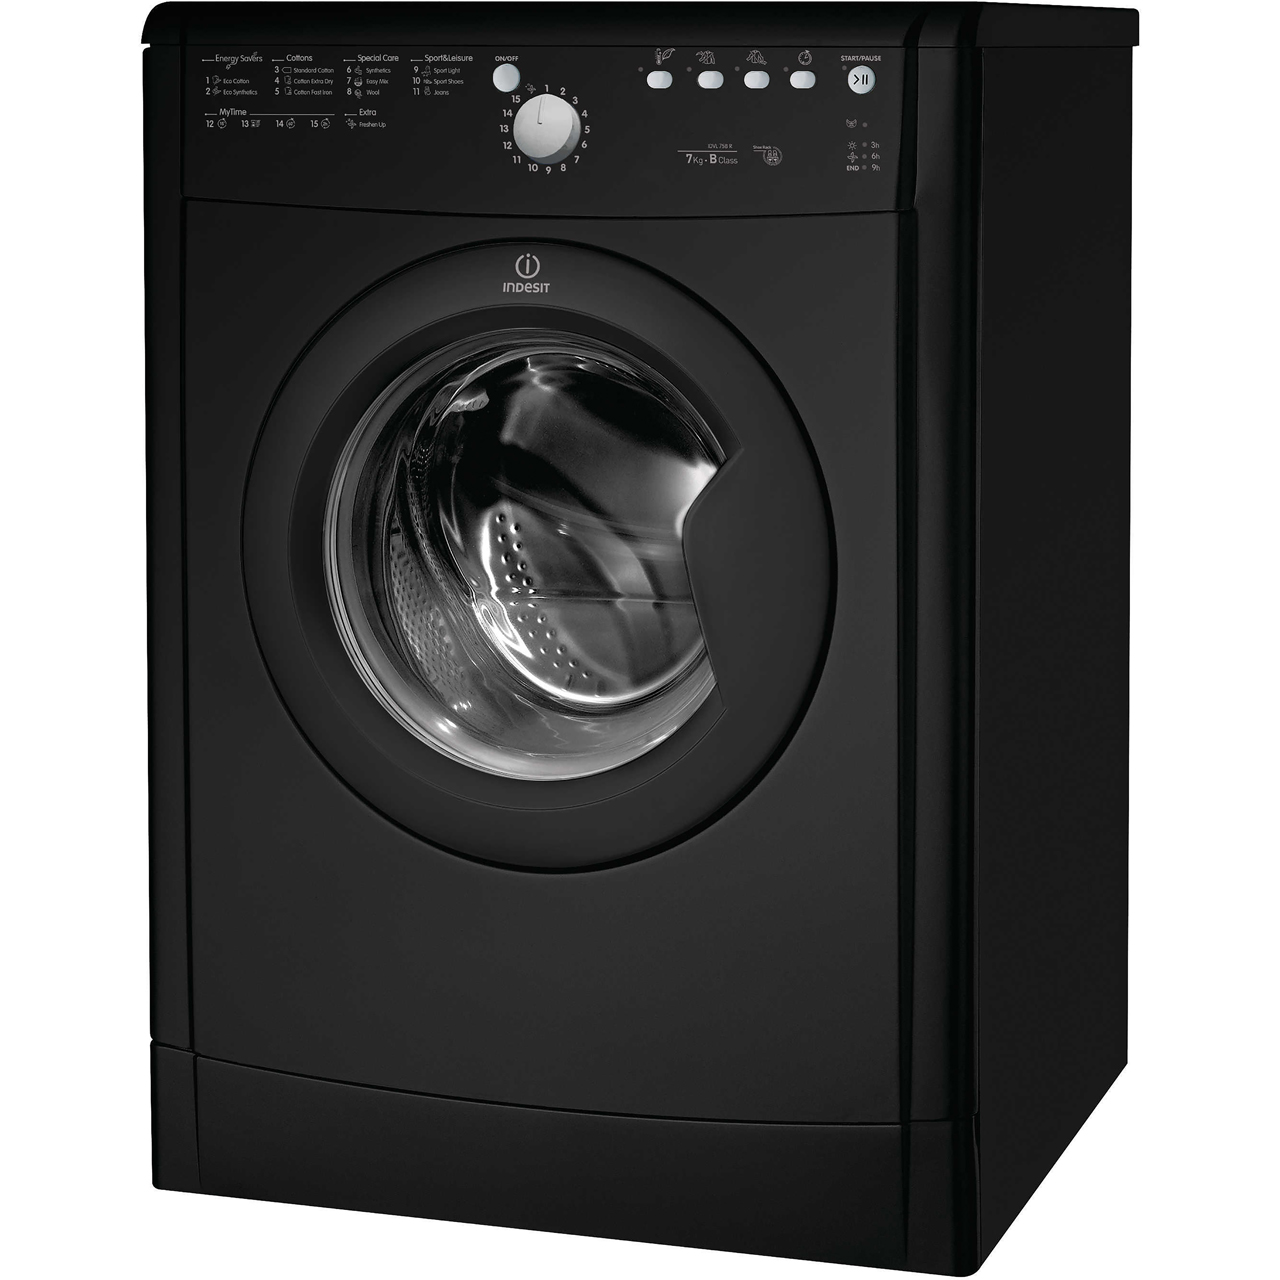 Indesit Eco Time IDVL75BRK 7Kg Vented Tumble Dryer